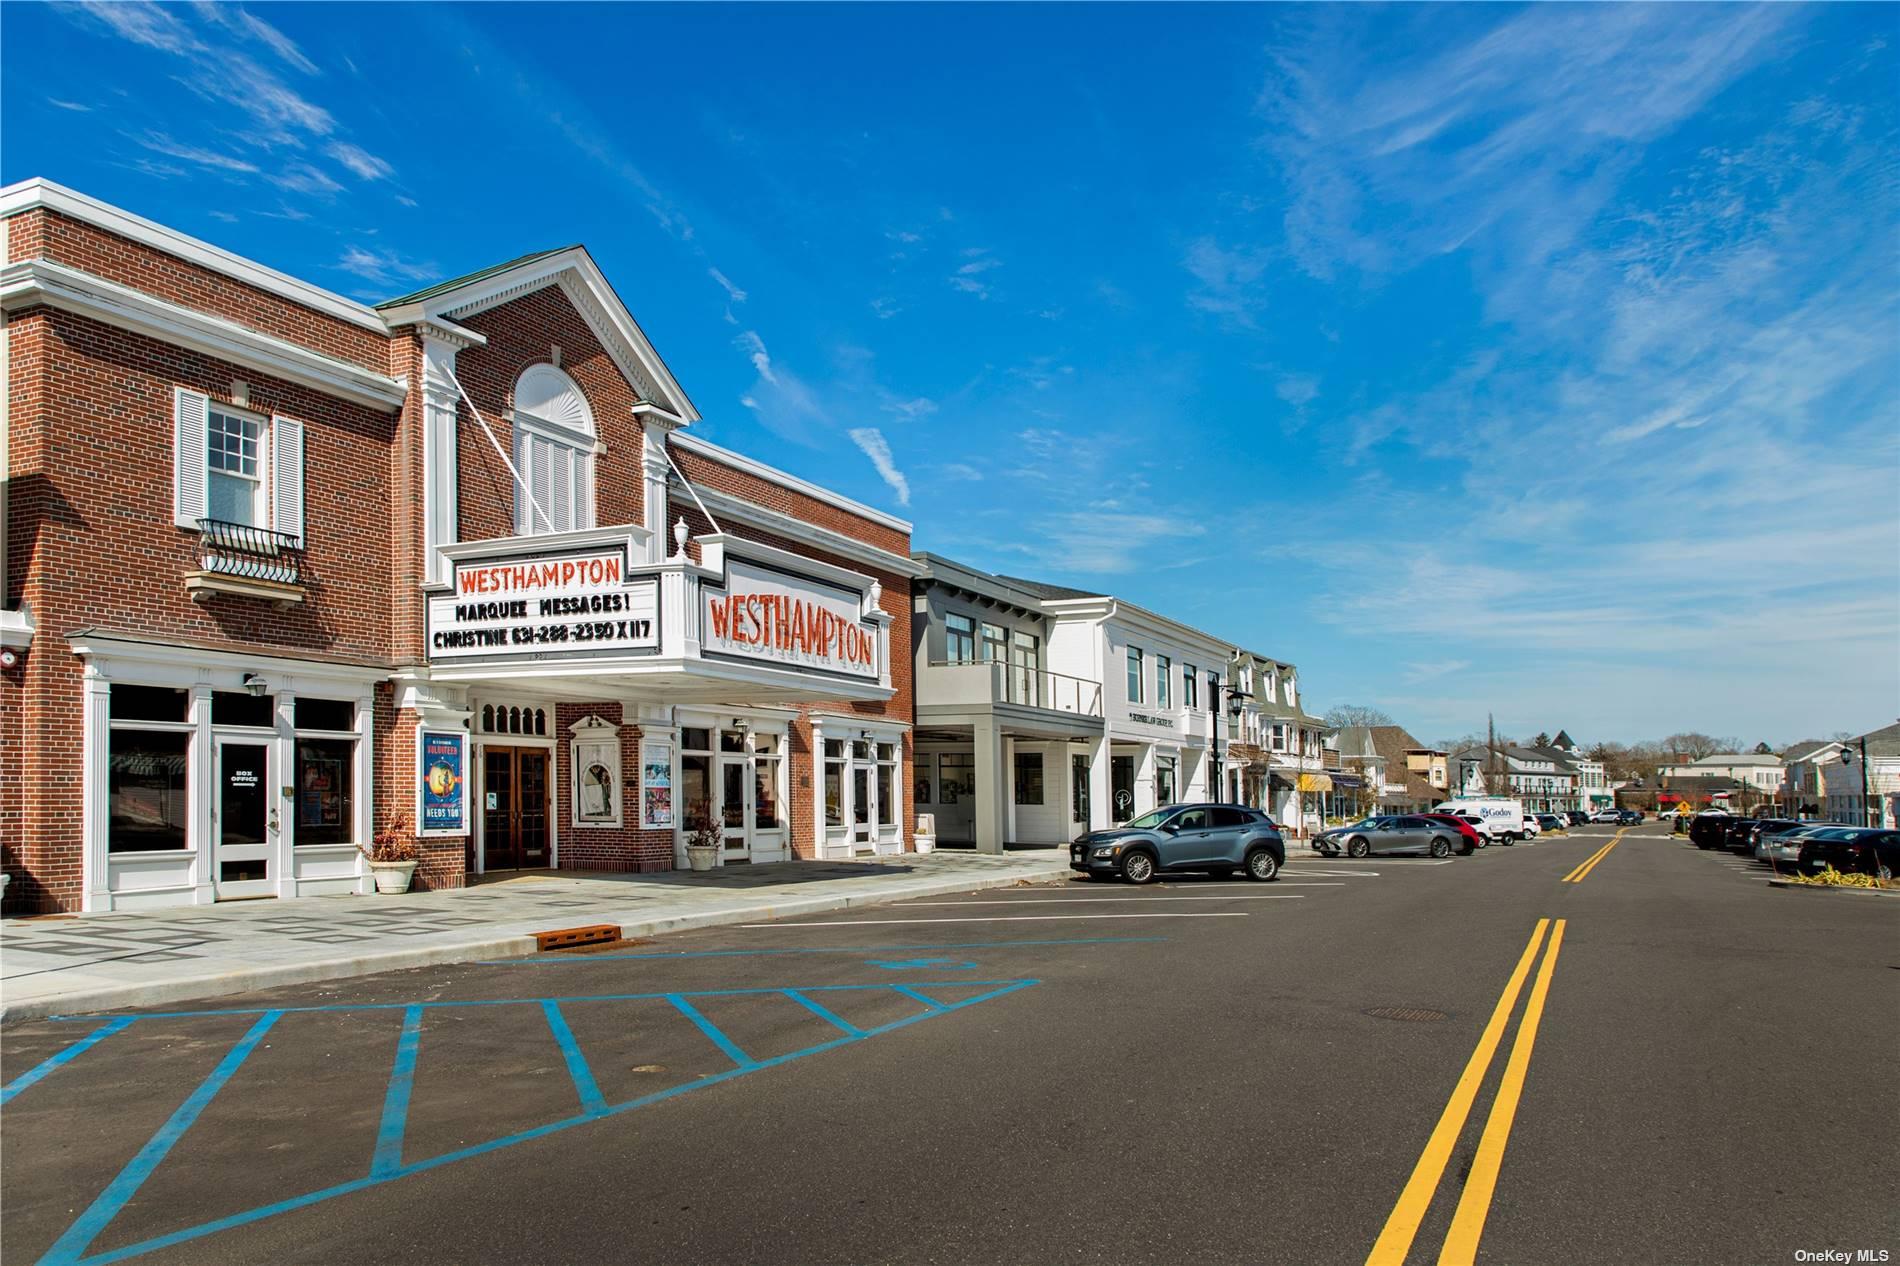 657 Dune Road, Westhampton, NY 1 Westhampton, NY 11977